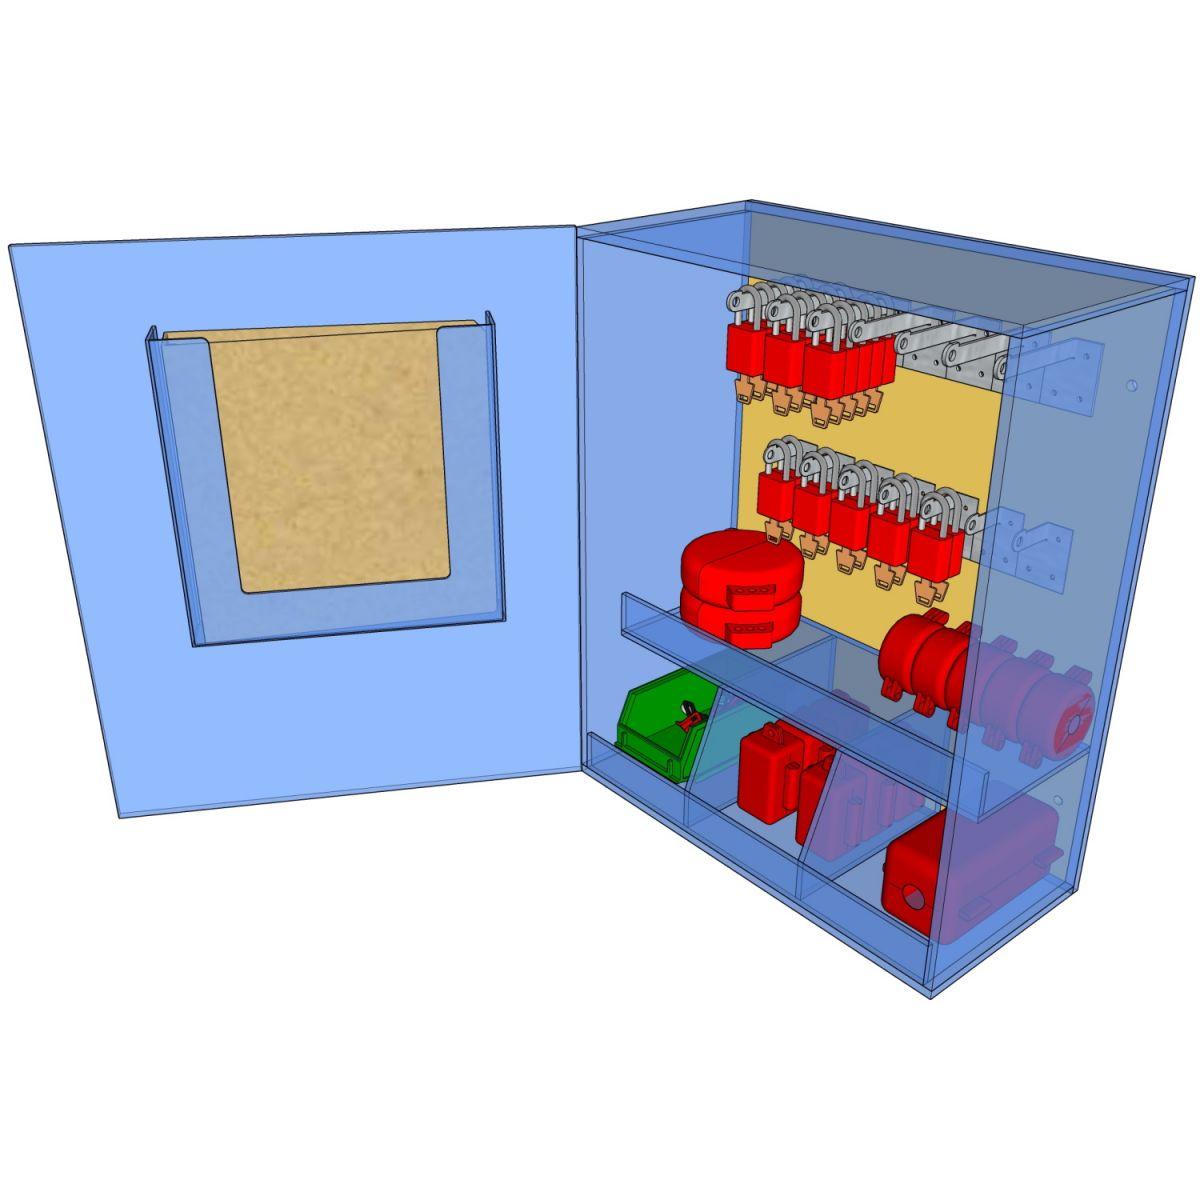 Postes de cadenassage en polycarbonate | PLC-1824